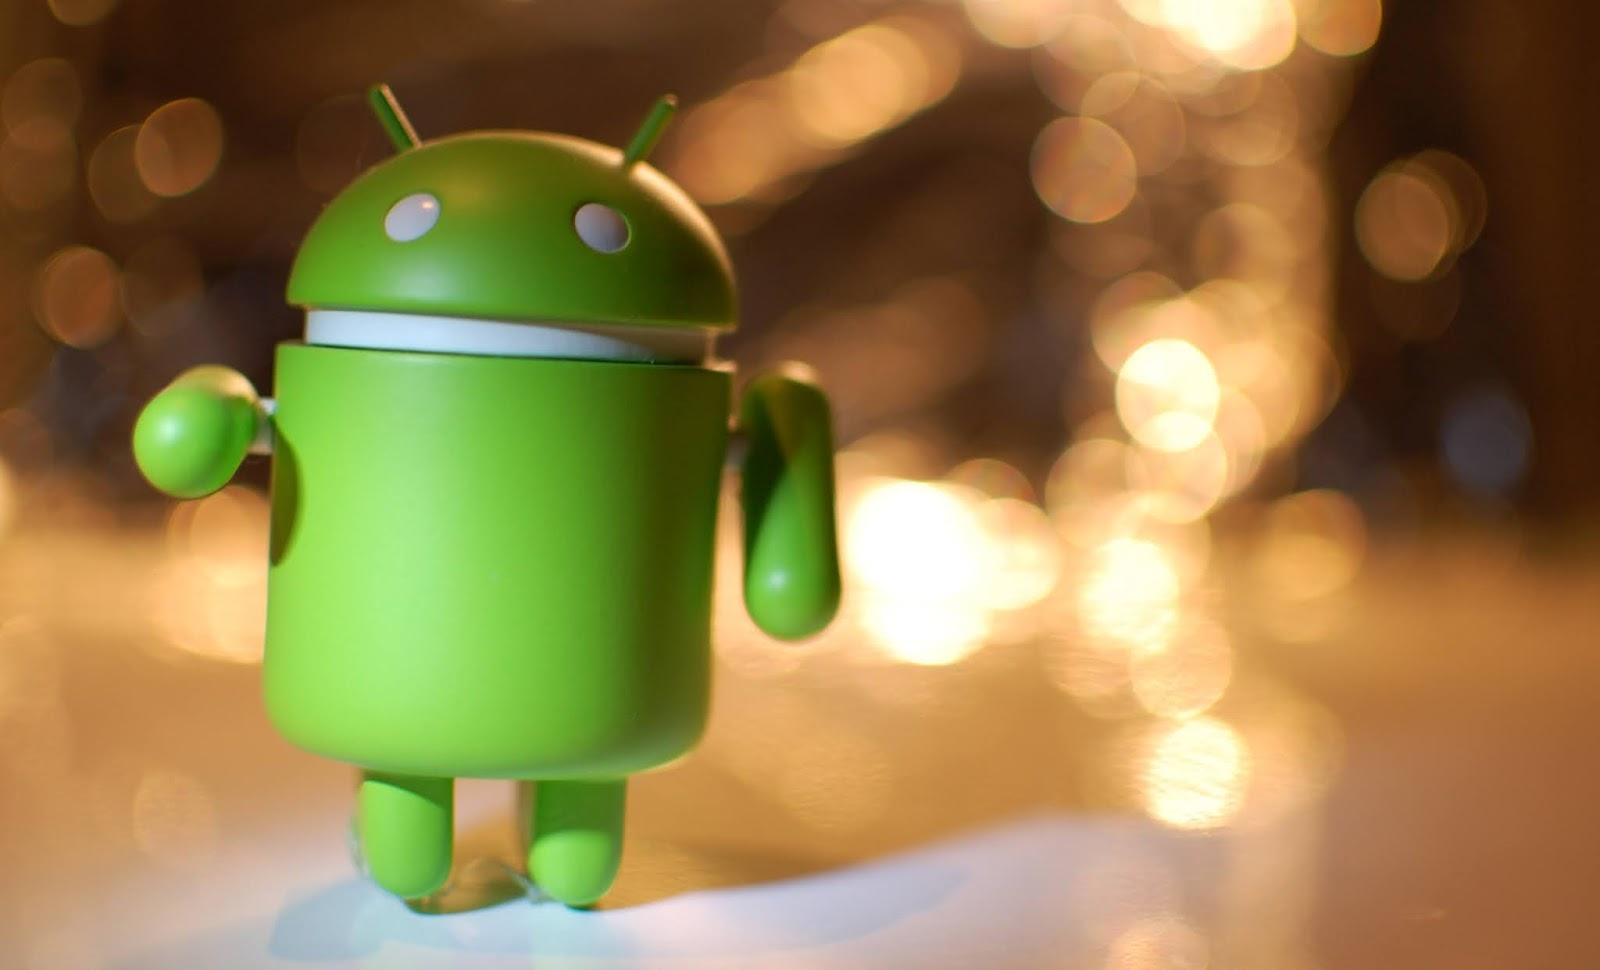 excelentes-ofertas-en-8-moviles-android-de-diferentes-marcas